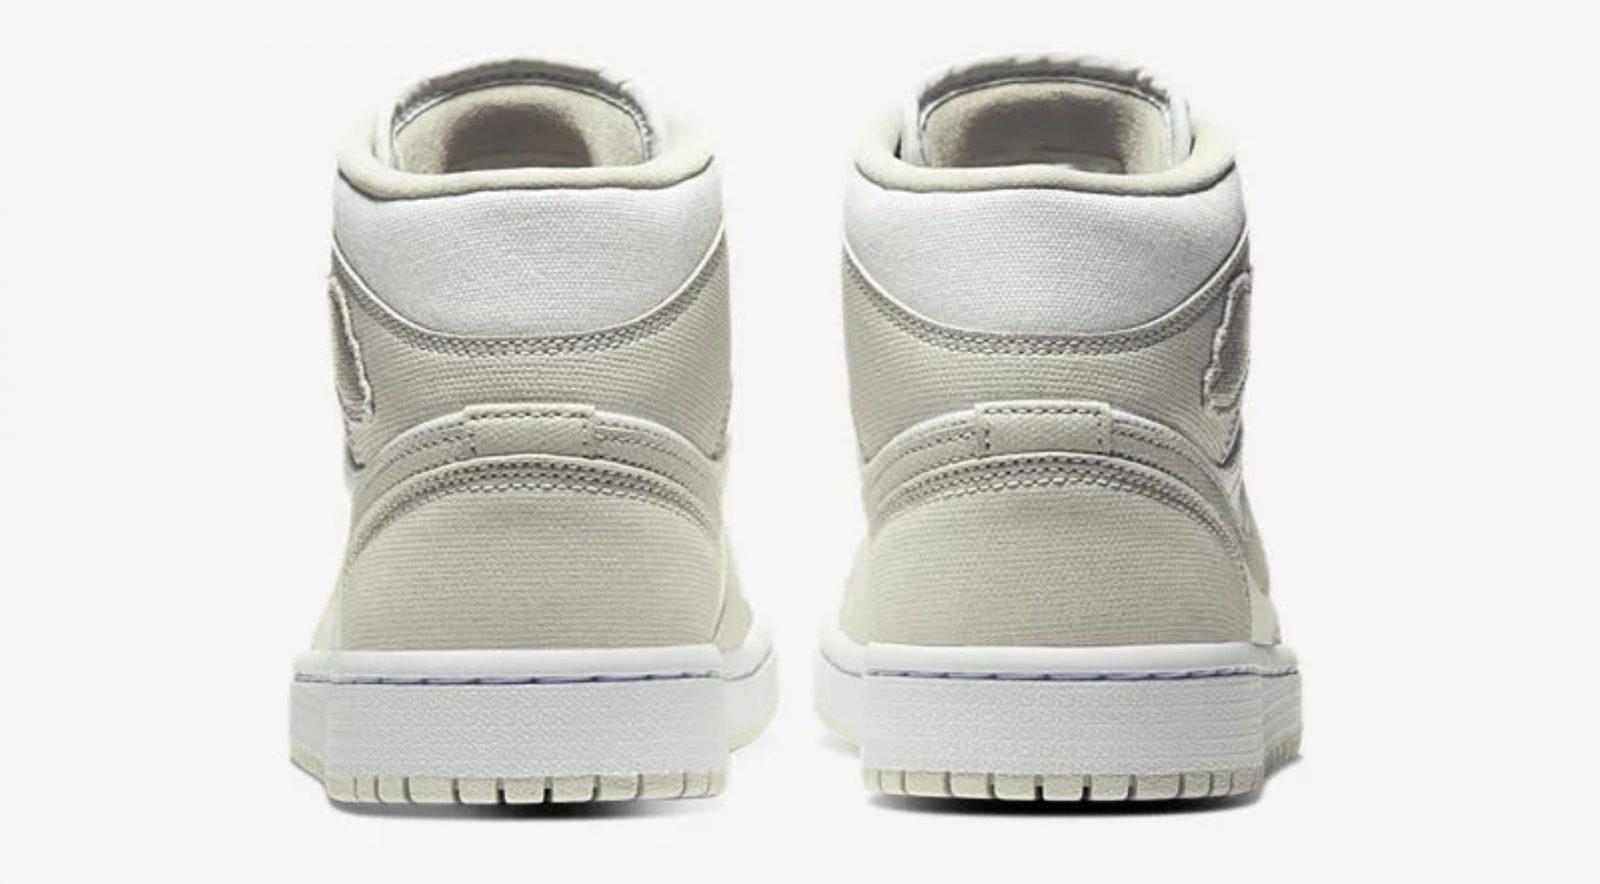 Pistachio Hues Create The Perfect Spring-Ready Nike Air Jordan 1 Mid 2 heel